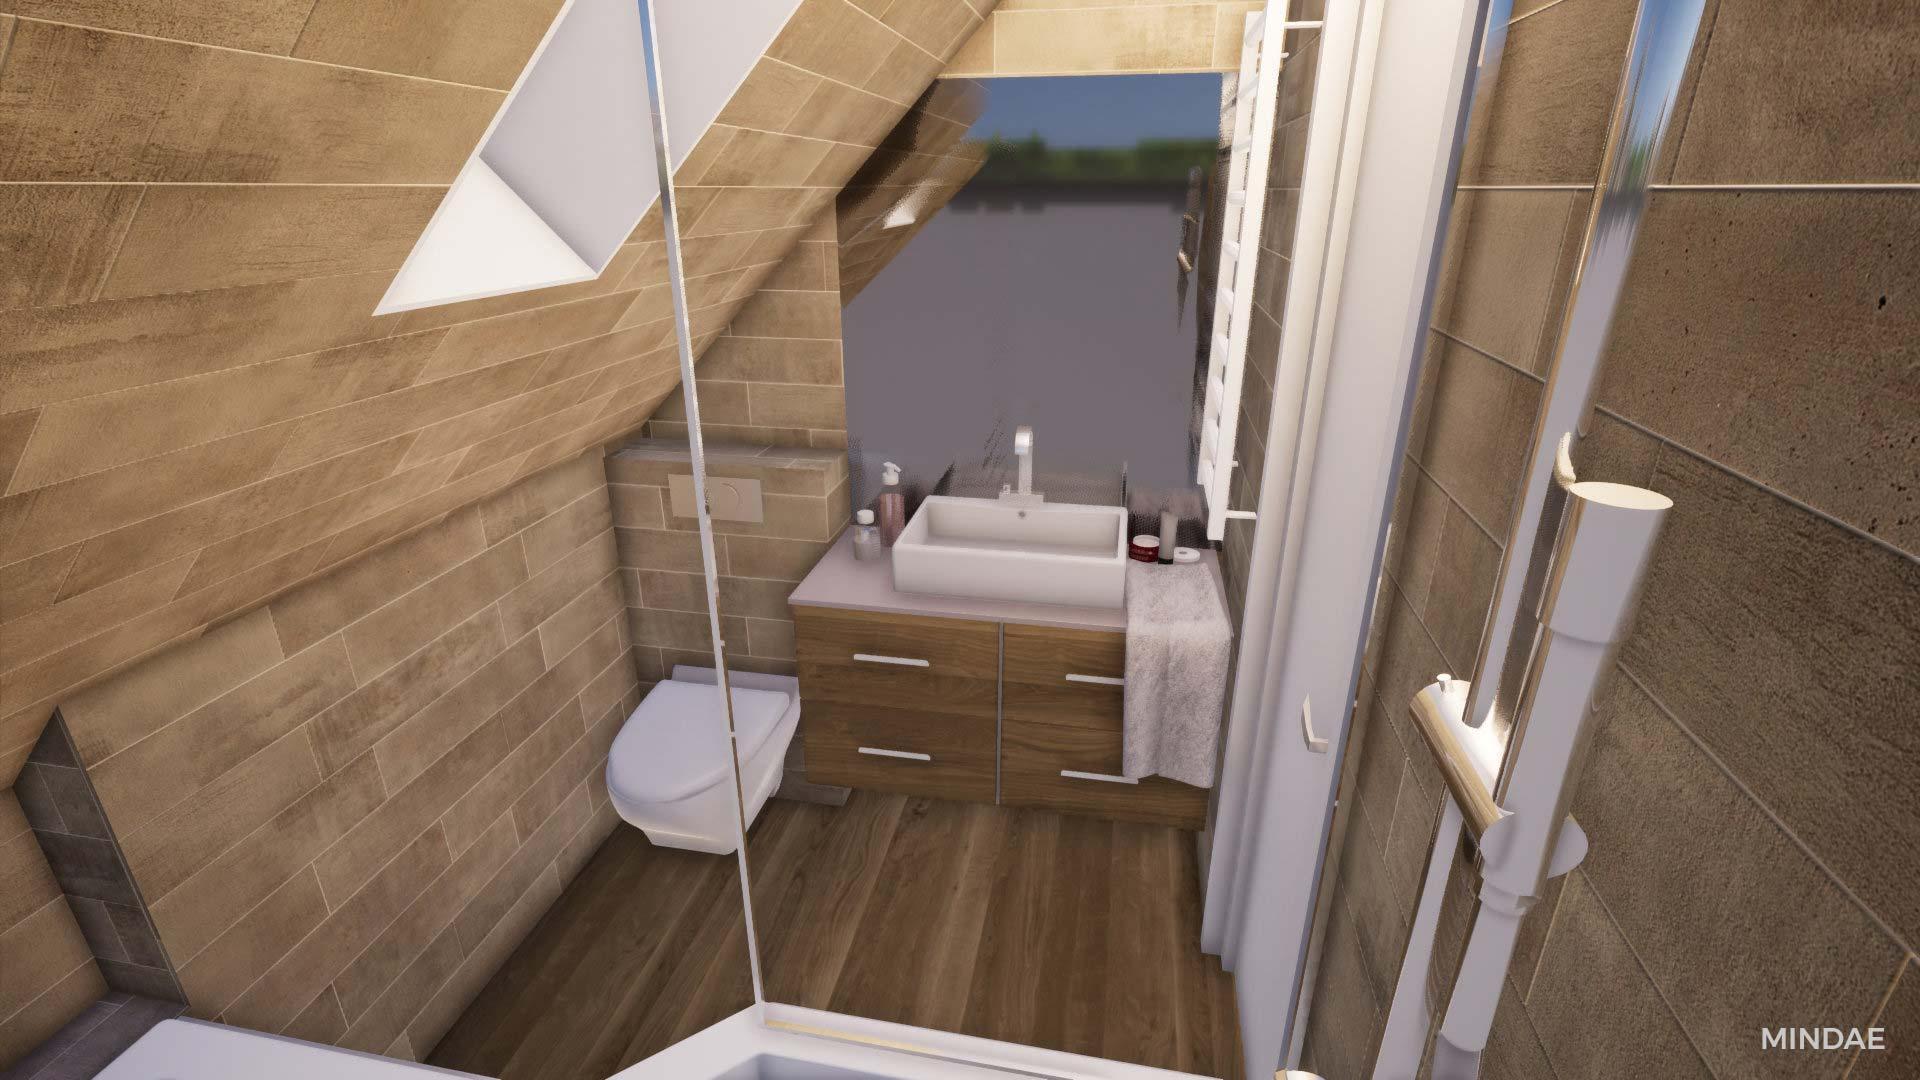 Mindae_3D_SDB_salle_de_bain_projet_renovation_2G_plomberie_calvados-(4)